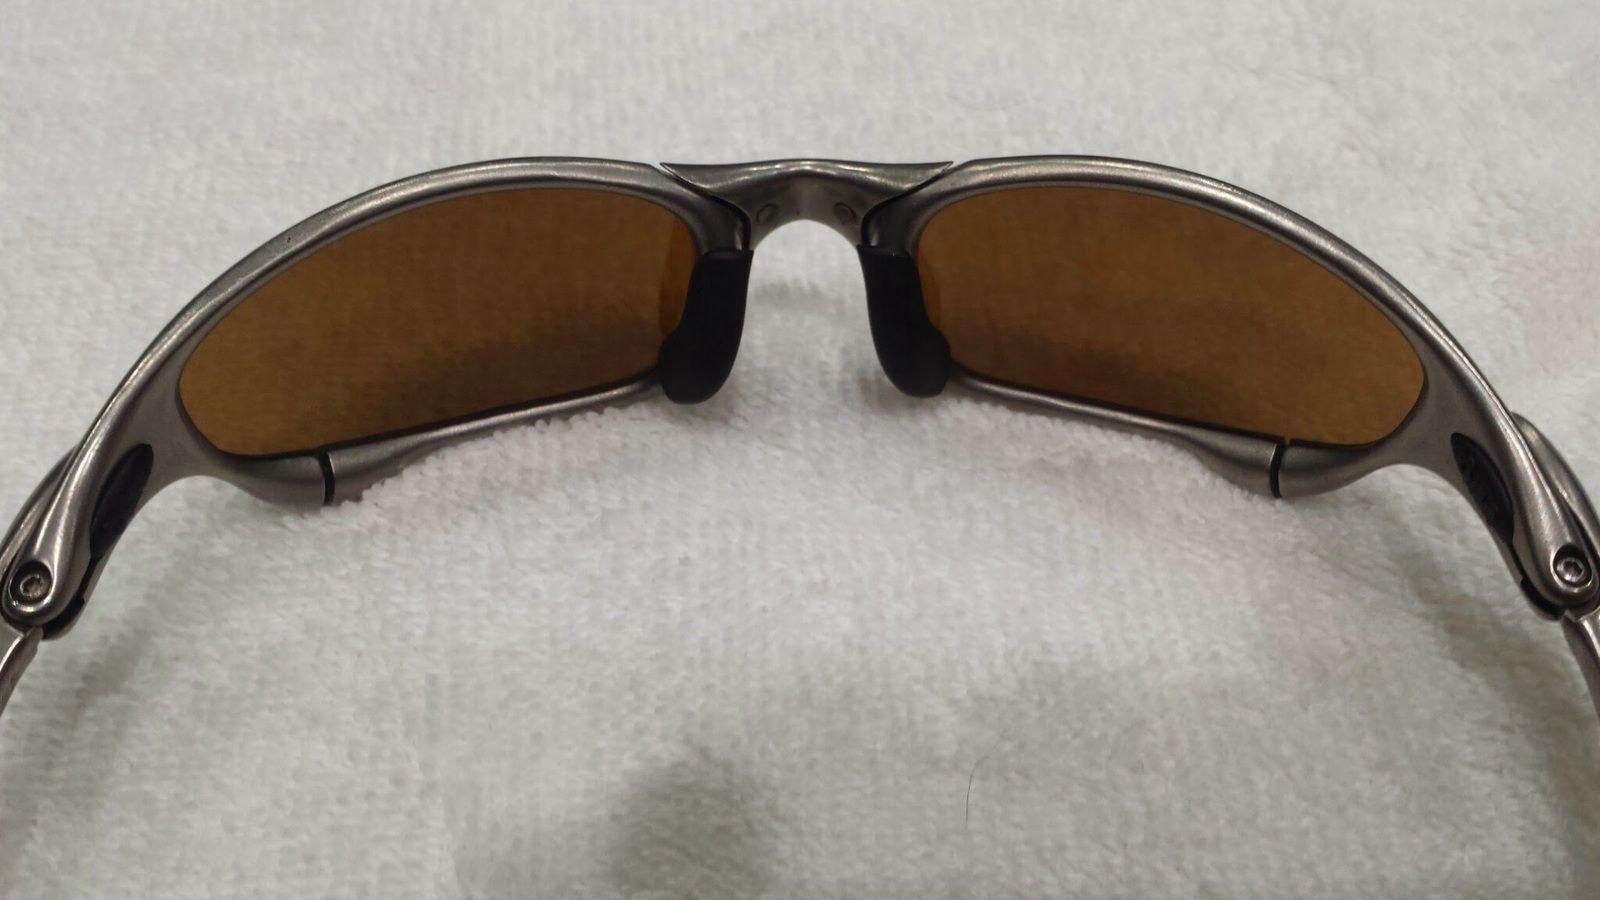 Juliet Titanium Serialized T######A - $240 Shipped - 20140320_194144.jpg